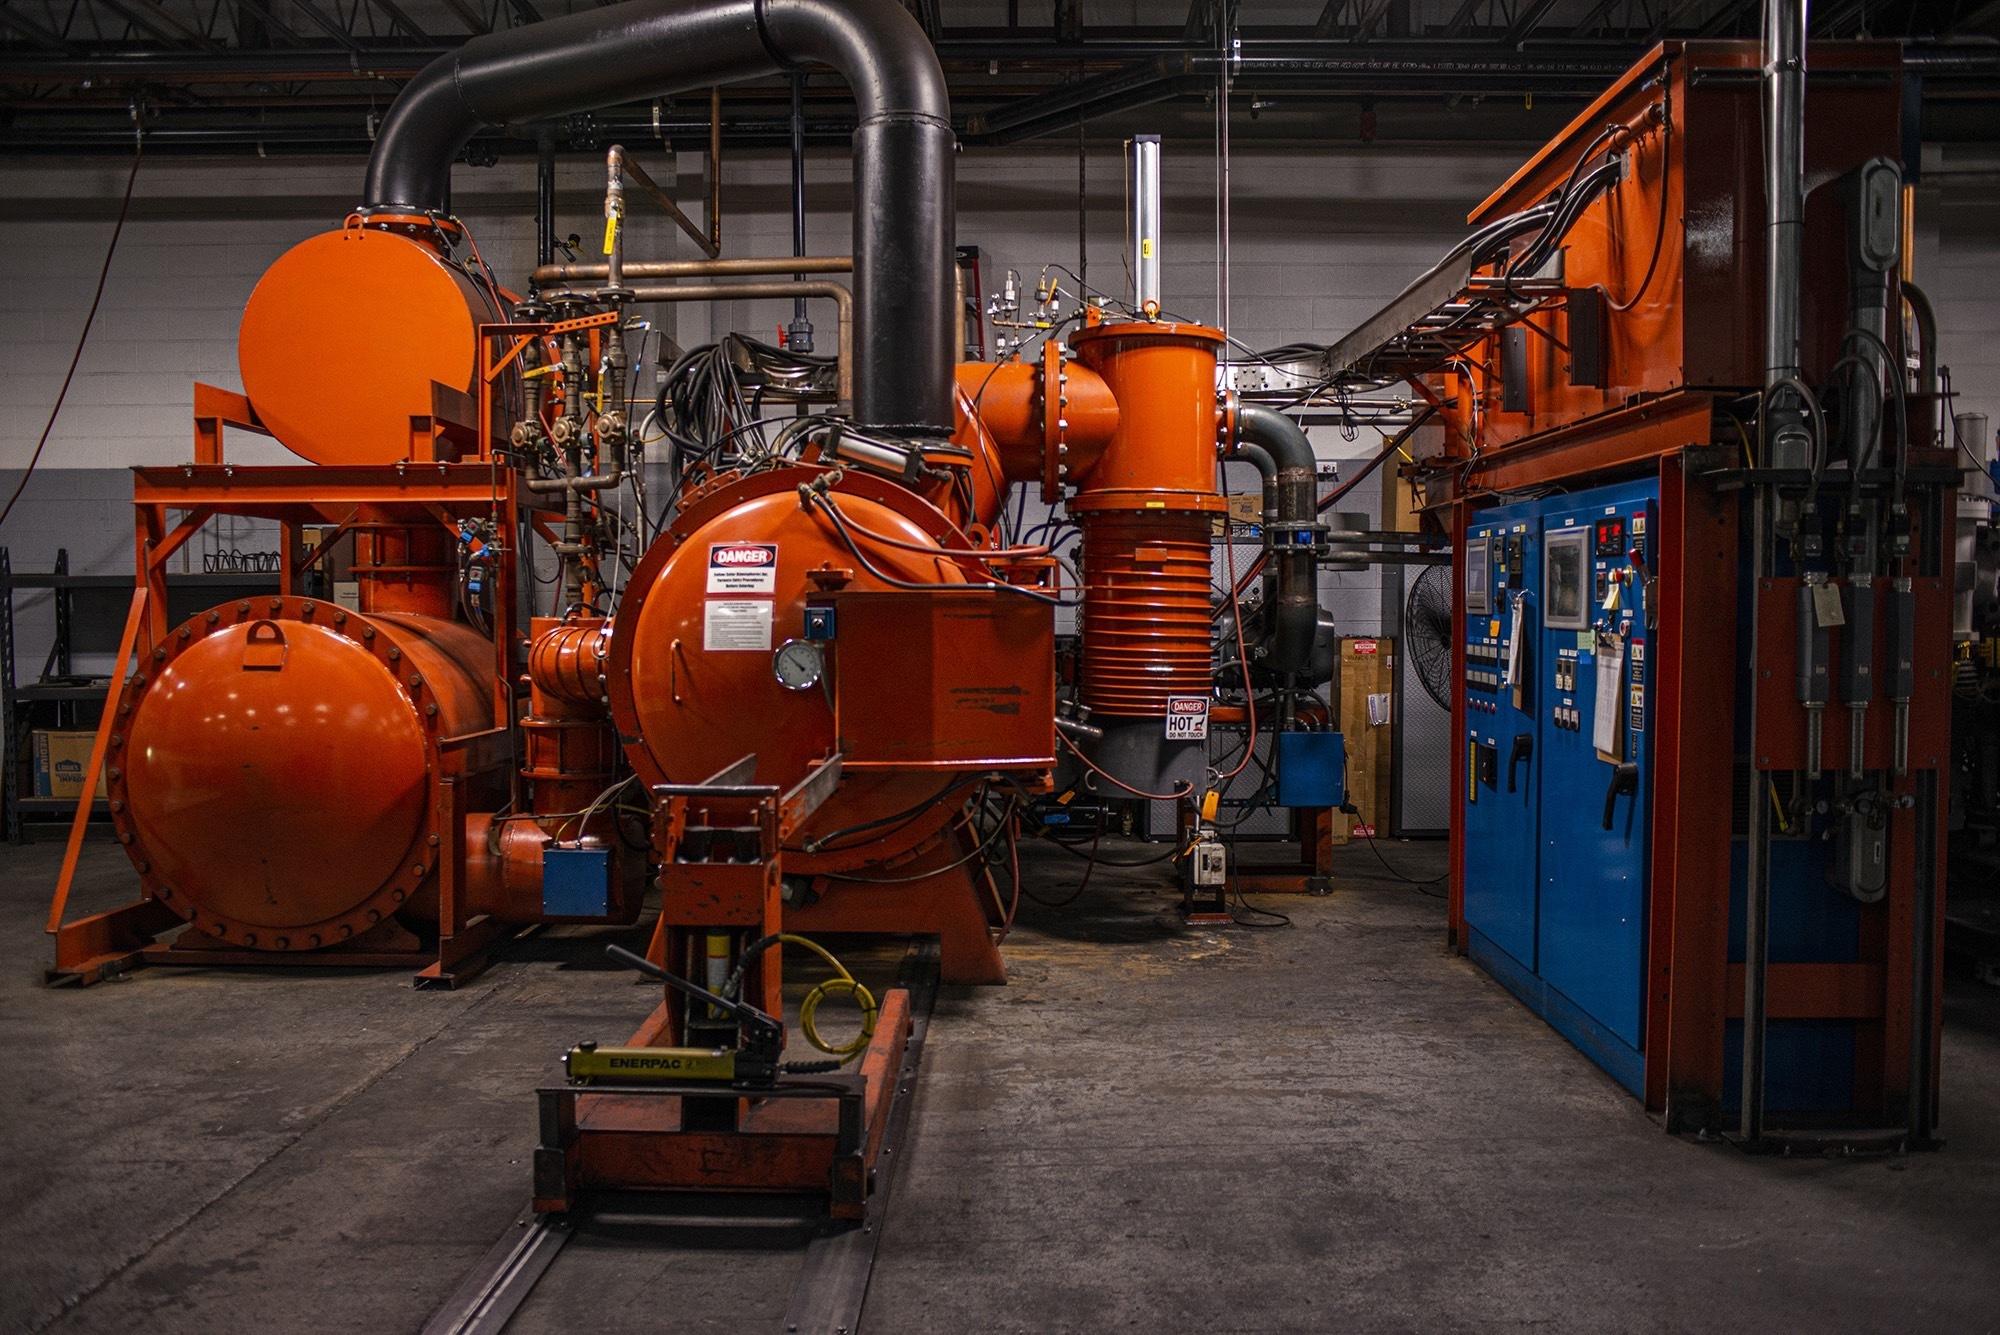 Vacu Braze facility displays furnace